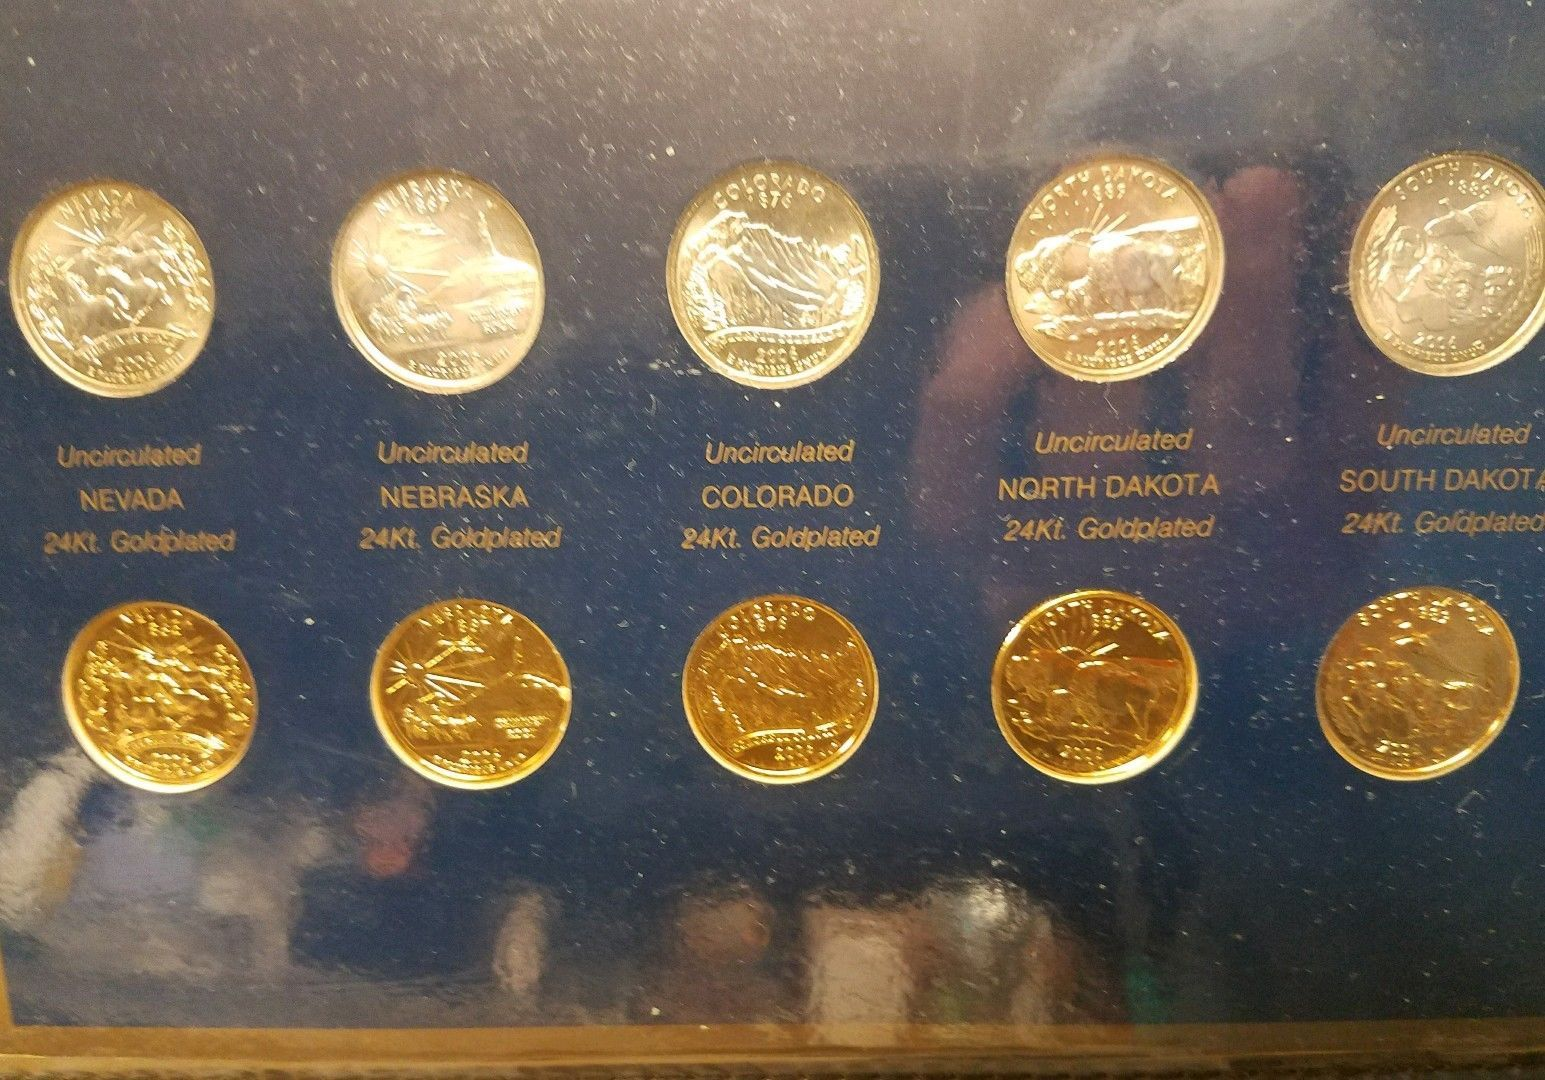 2006 North Dakota State Quarter P /& D Postal Commemorative Society Statehood